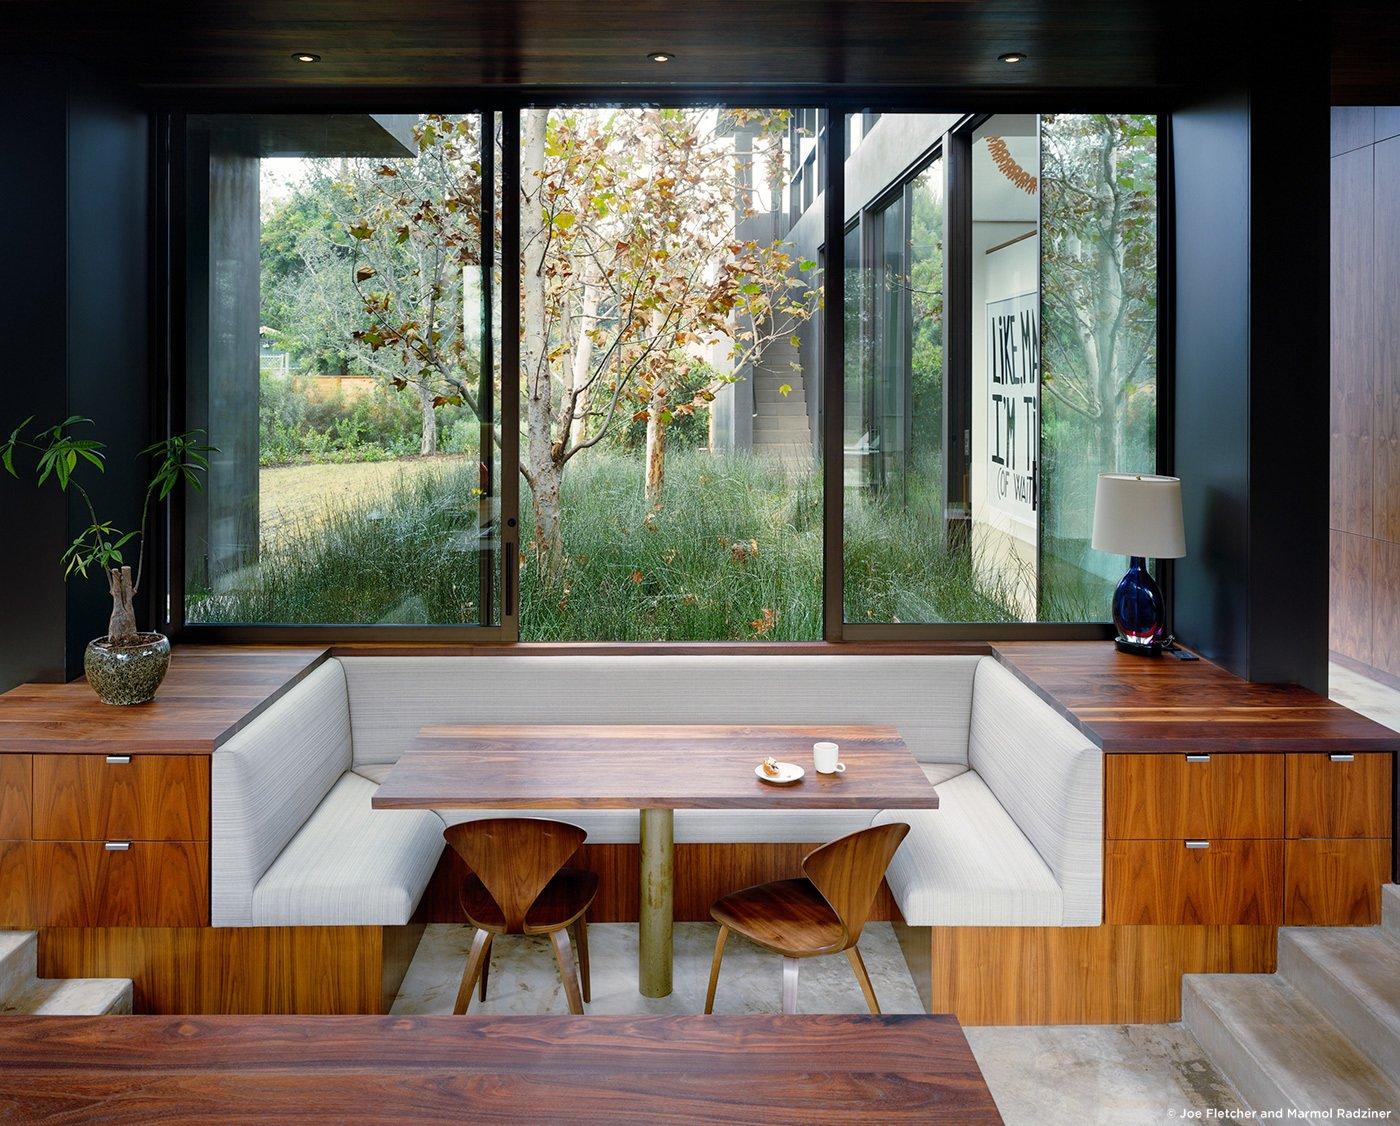 #ViennaWayResidence #modern #midcentury #inside #interior #windows #lighting #dining #wood #table #seating #booth #storage #exterior #landscape #Venice #California #MarmolRadziner  Vienna Way Residence